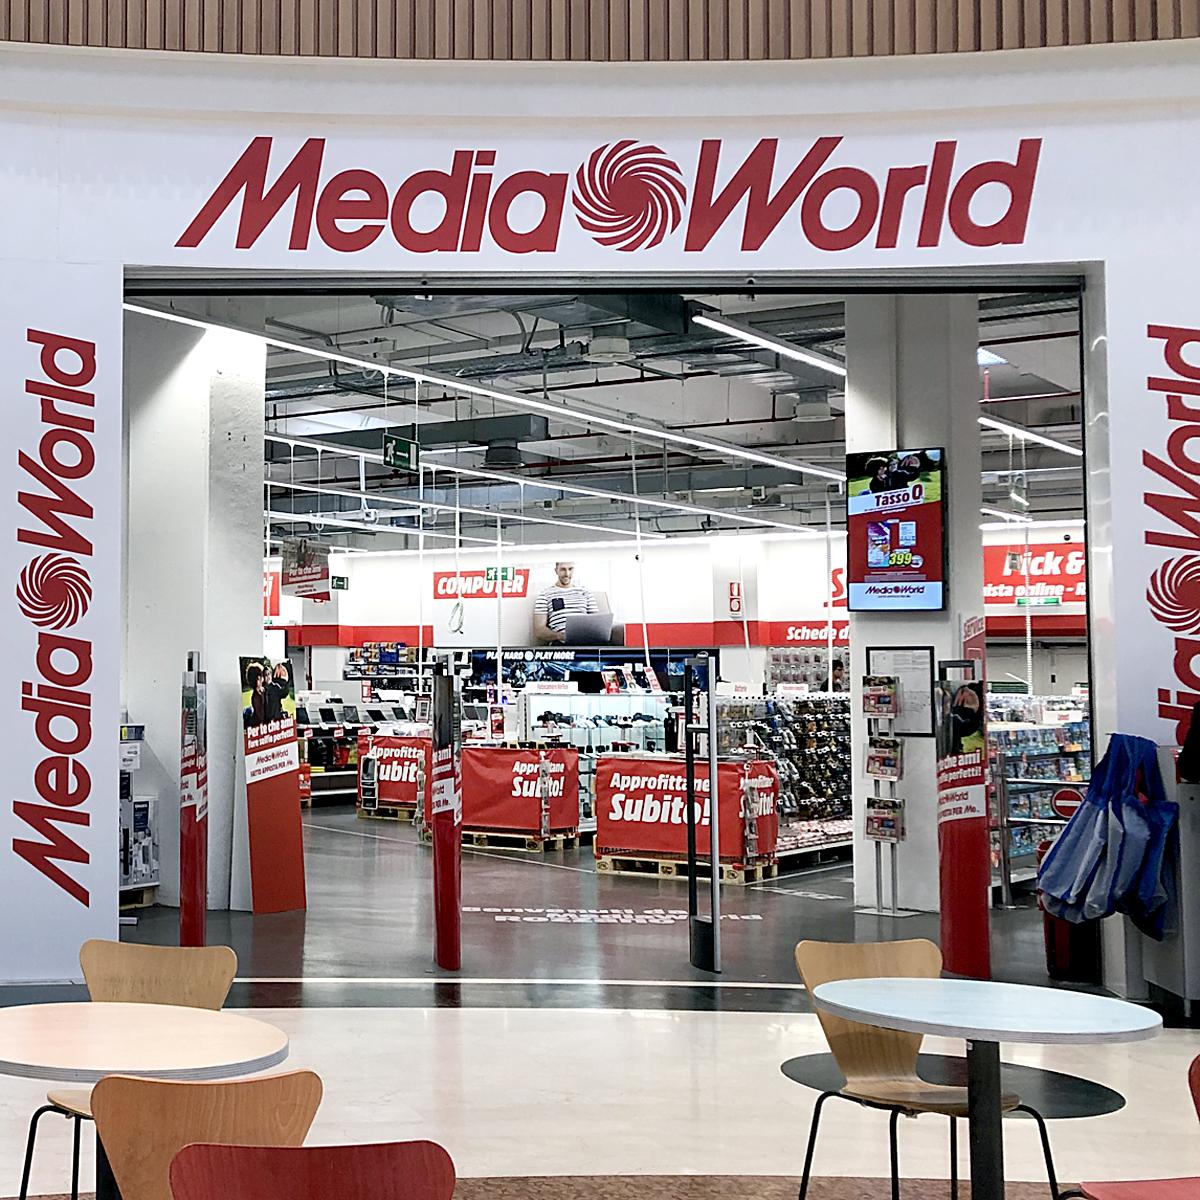 MEDIA WORLD - Fiordaliso